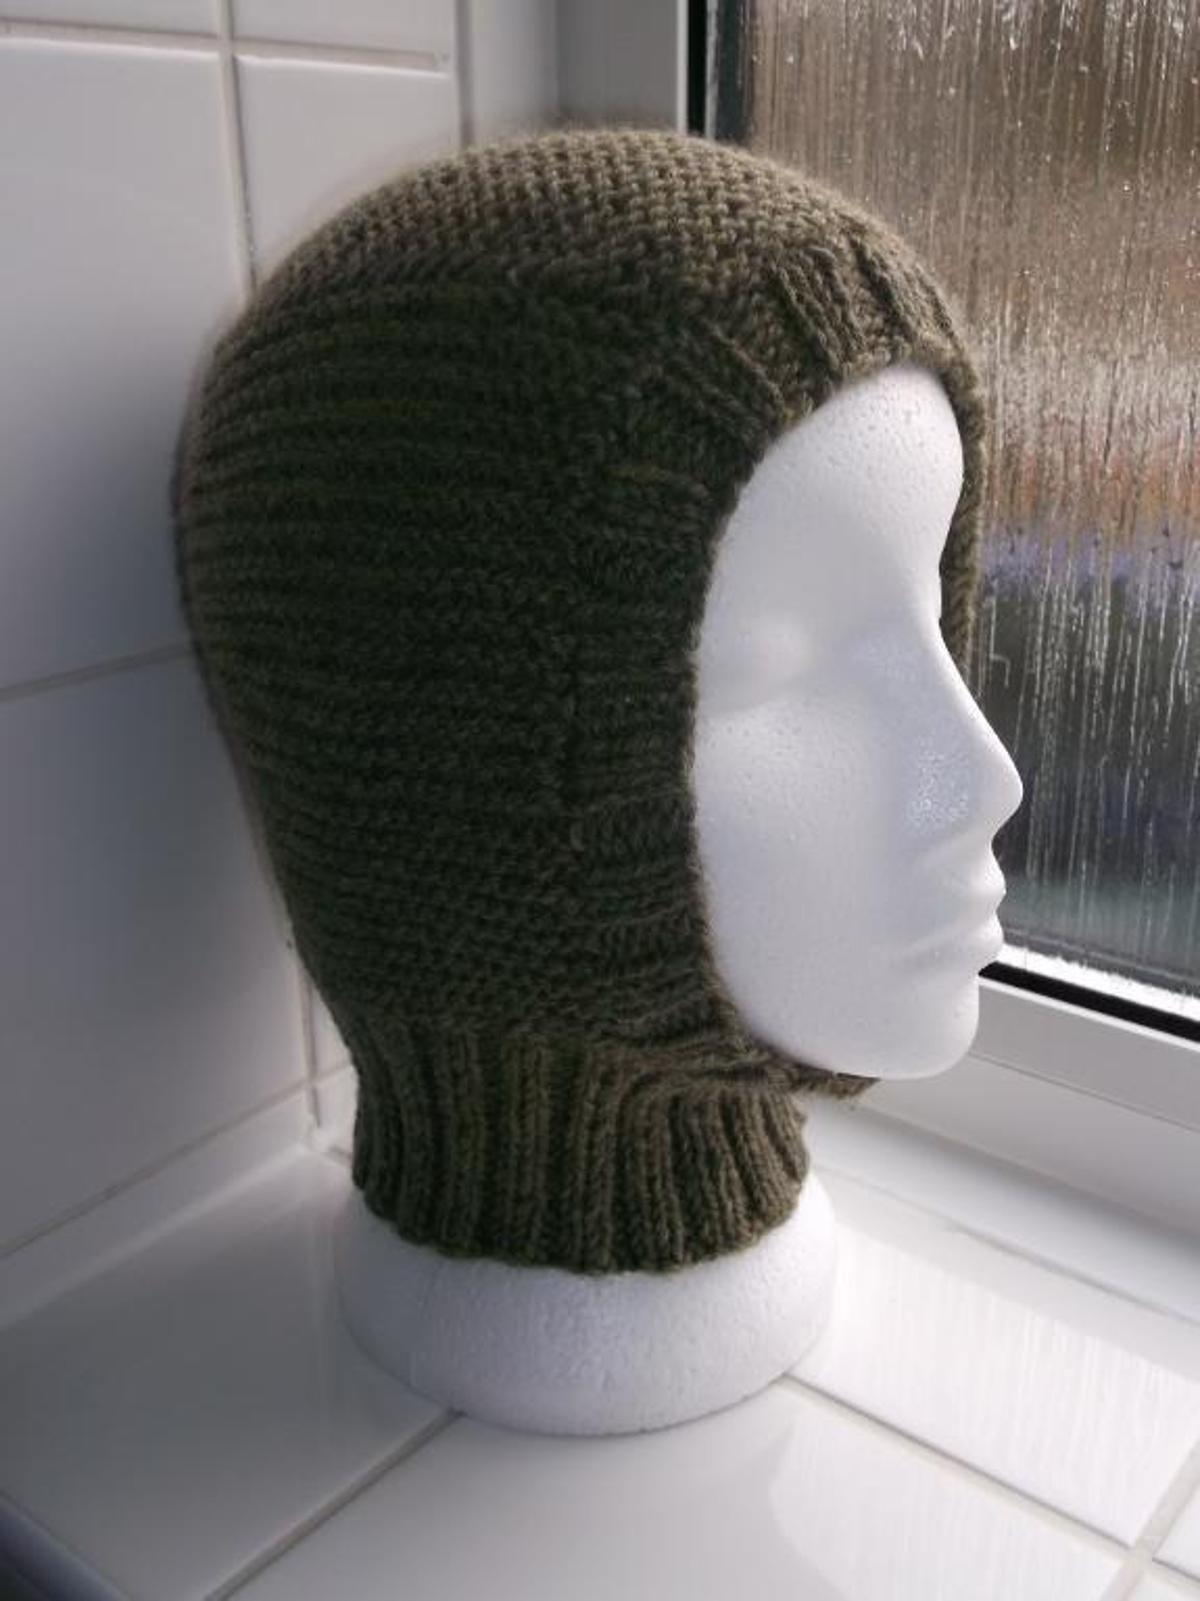 Balaclava | Craftsy | Knitting - Hats | Pinterest | Balaclava ...